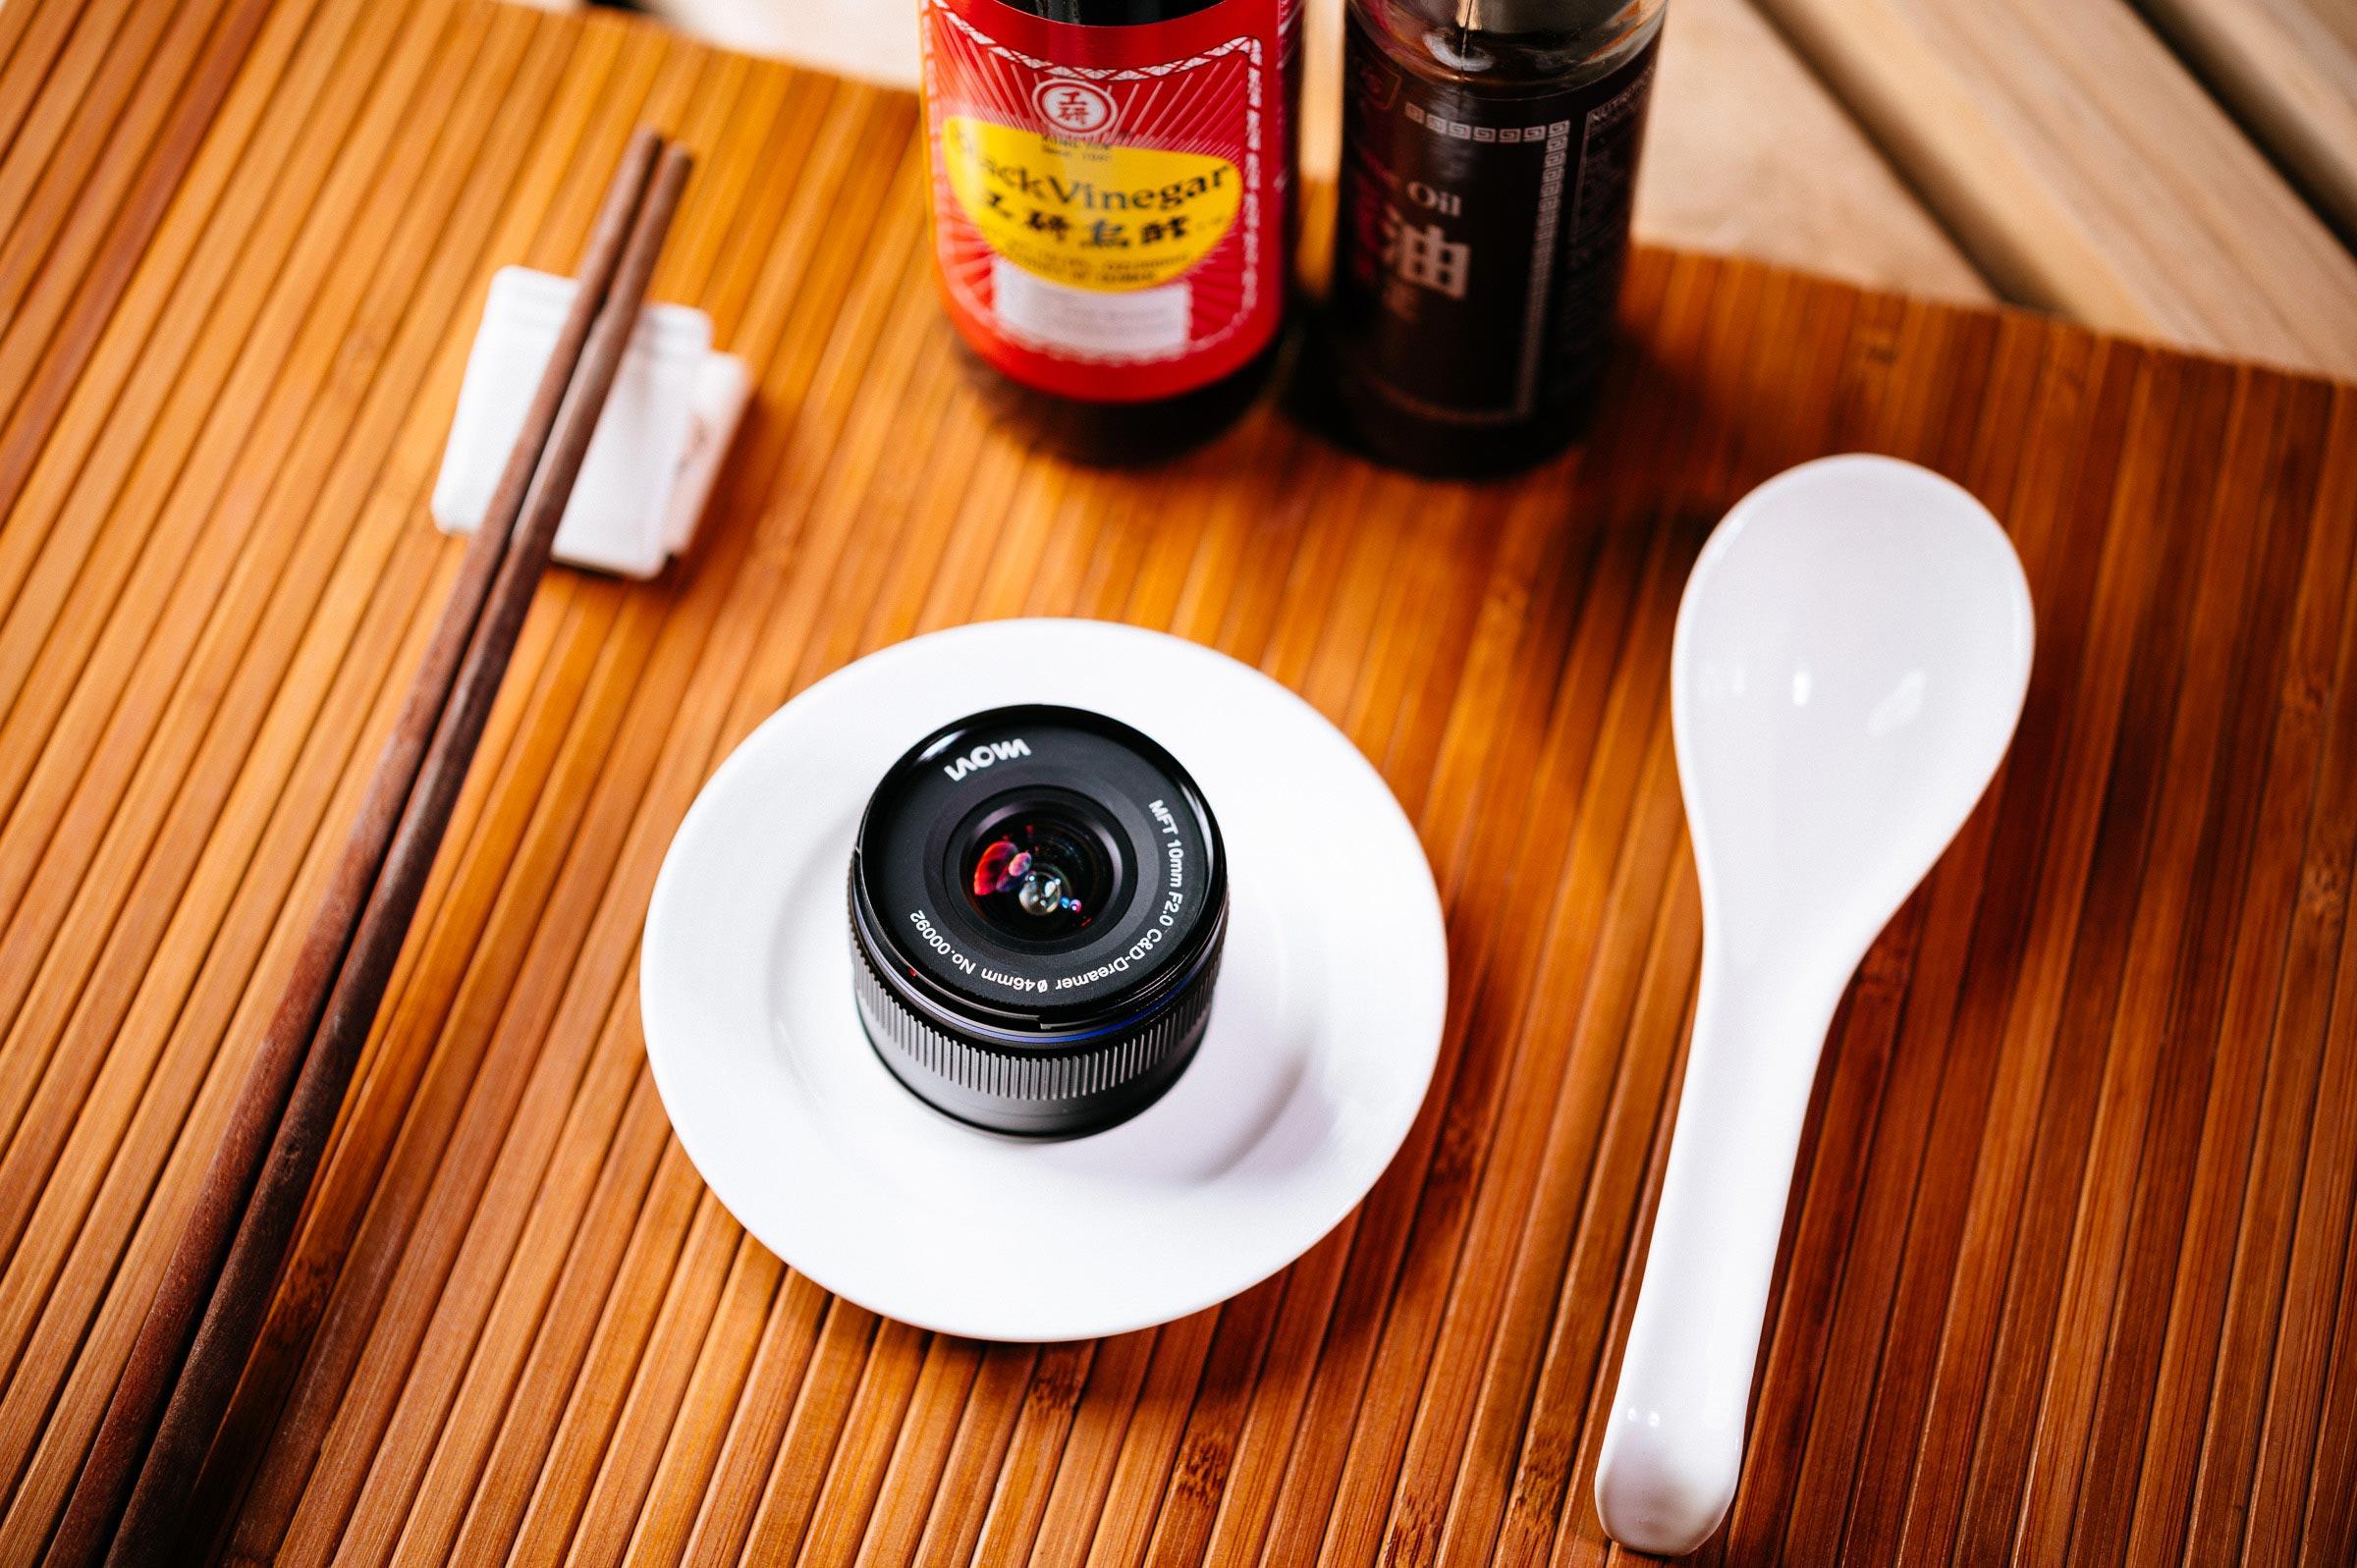 Laowa 10mm f/2 Zero-D MFT, a pocket lens for Micro Four Thirds